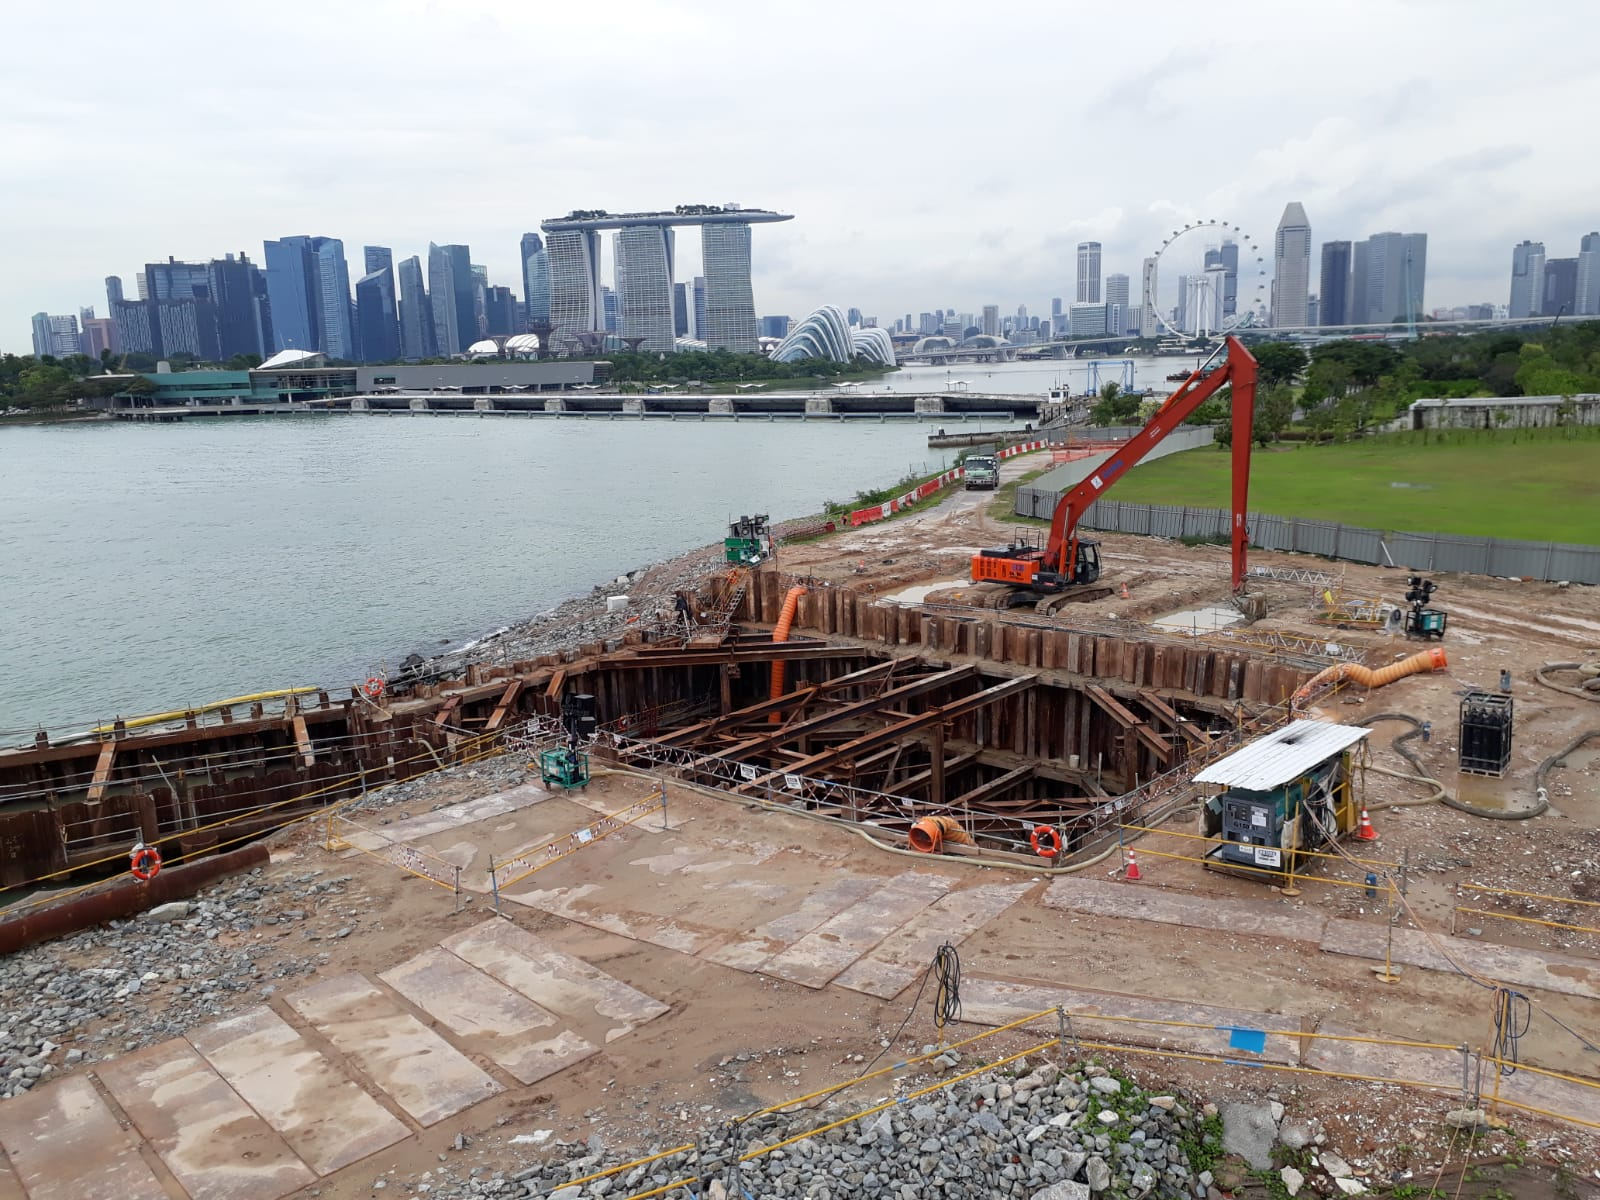 Marina East Desalination Plant Offshore - 2017